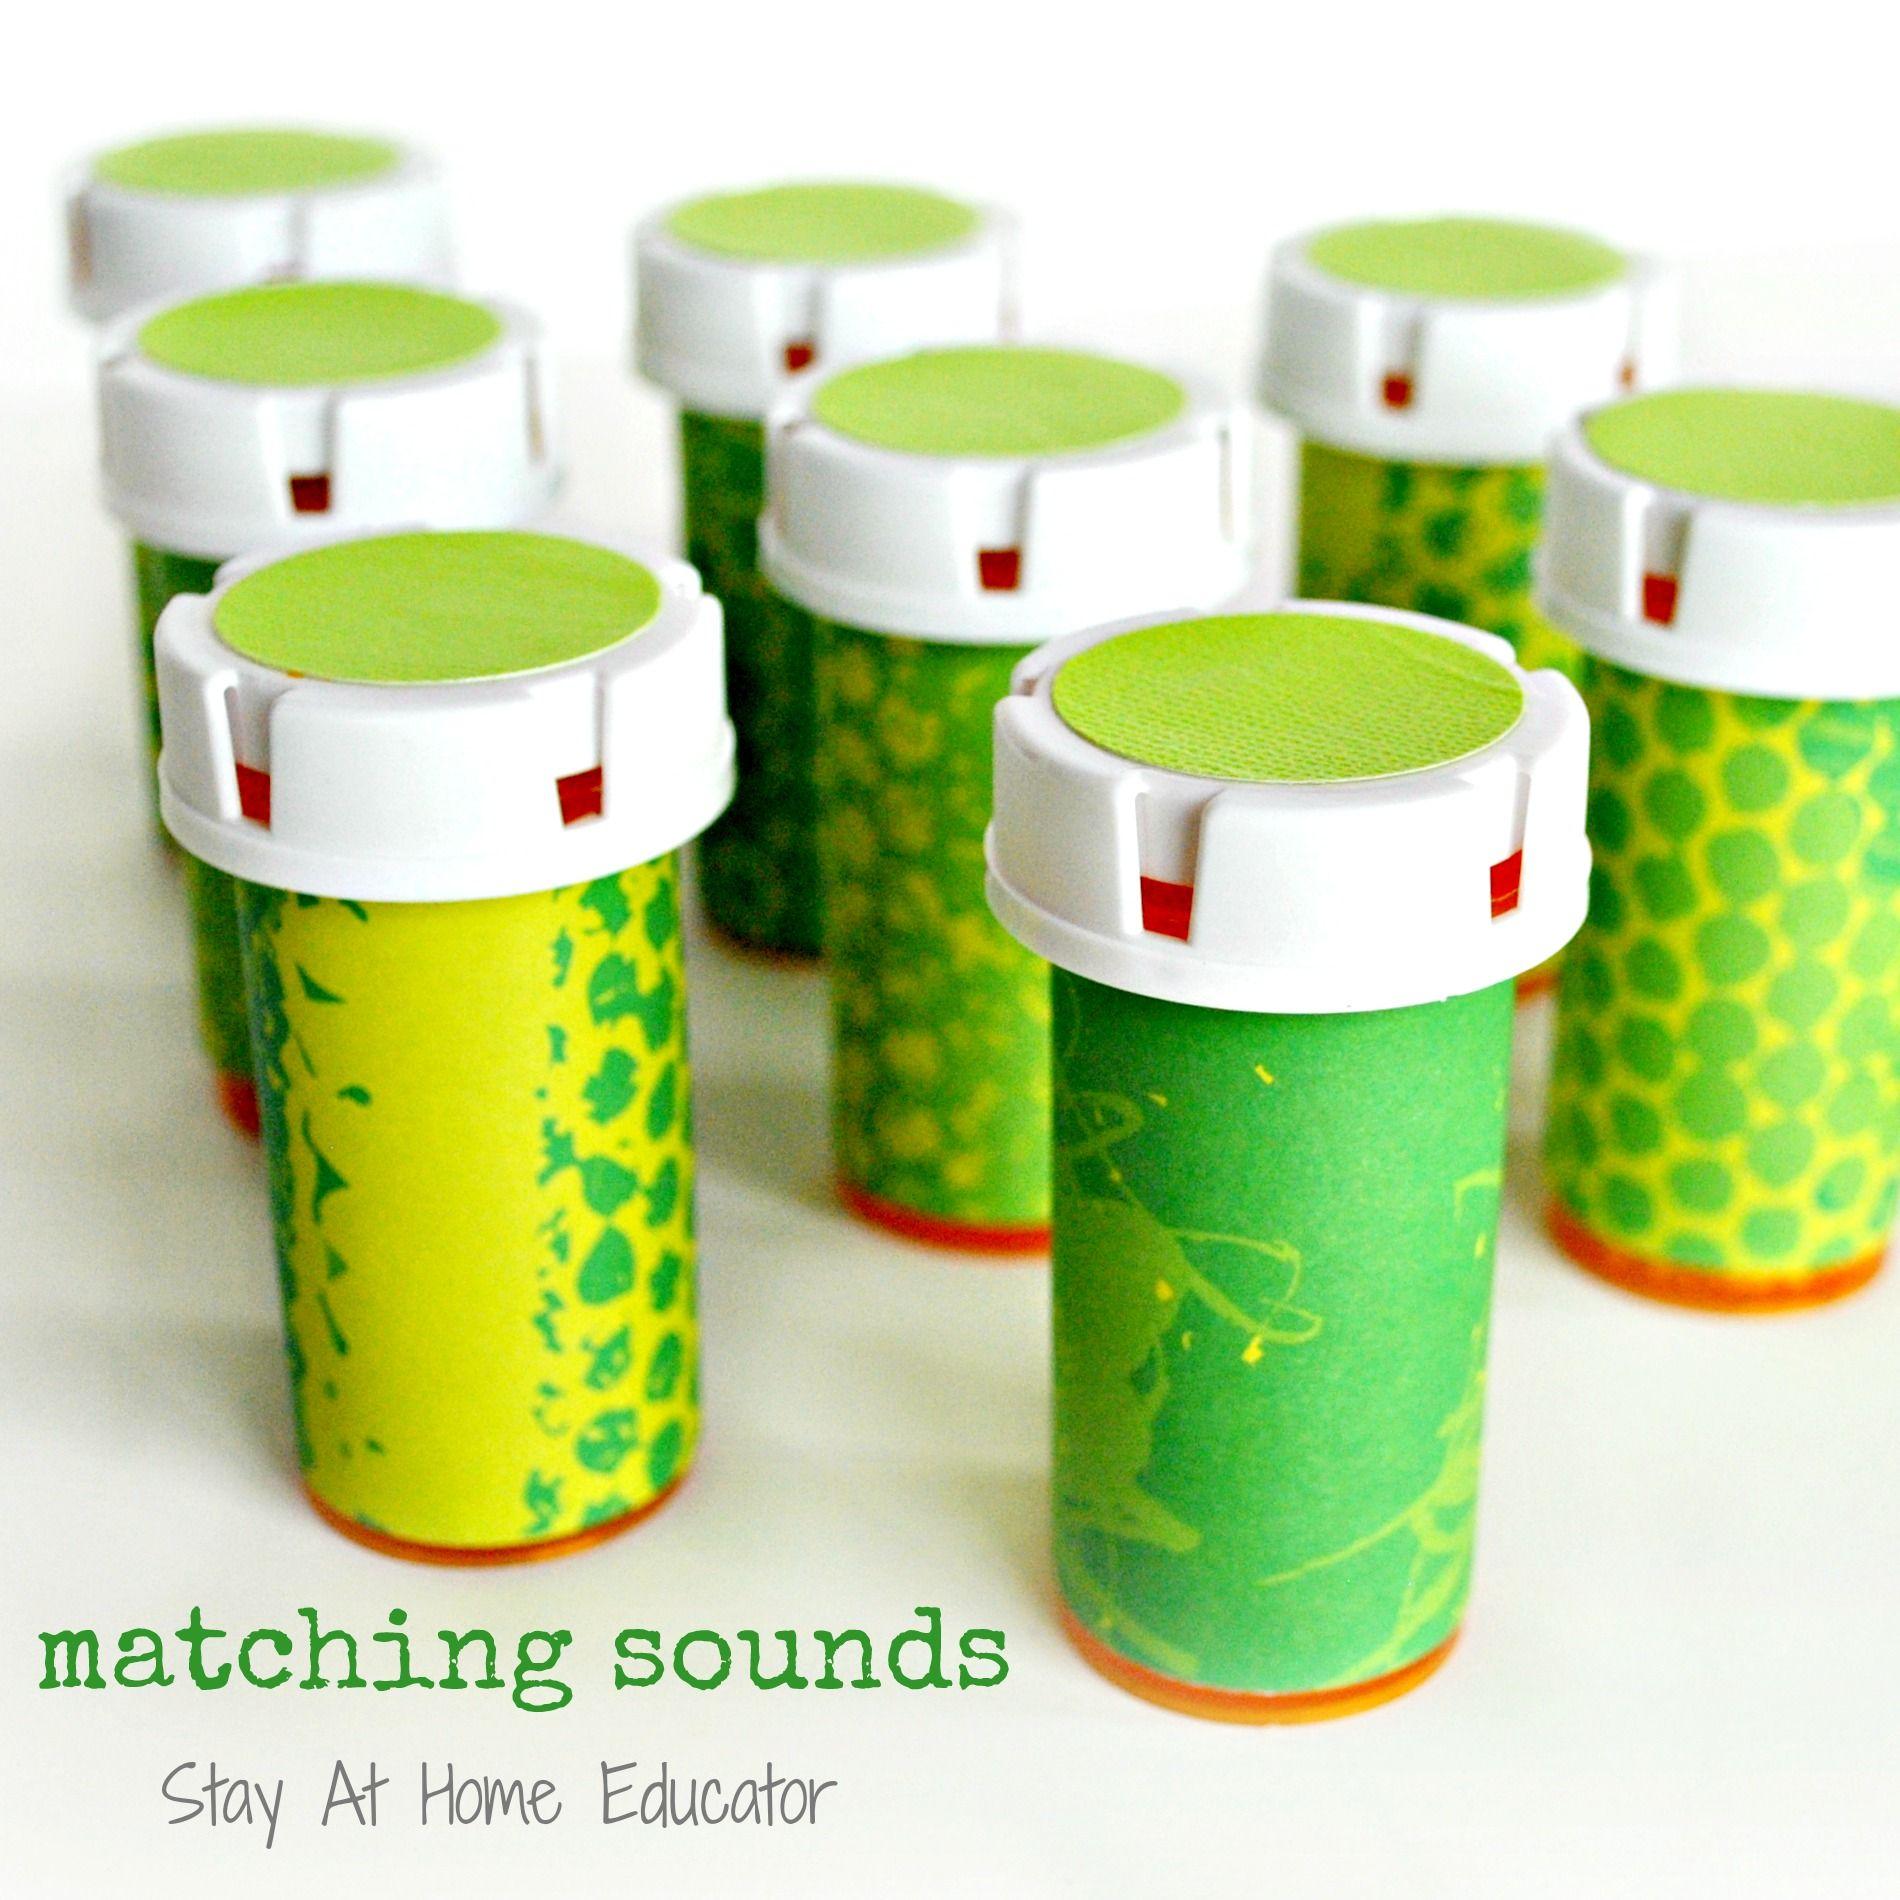 Matching Sounds A Five Senses Activity